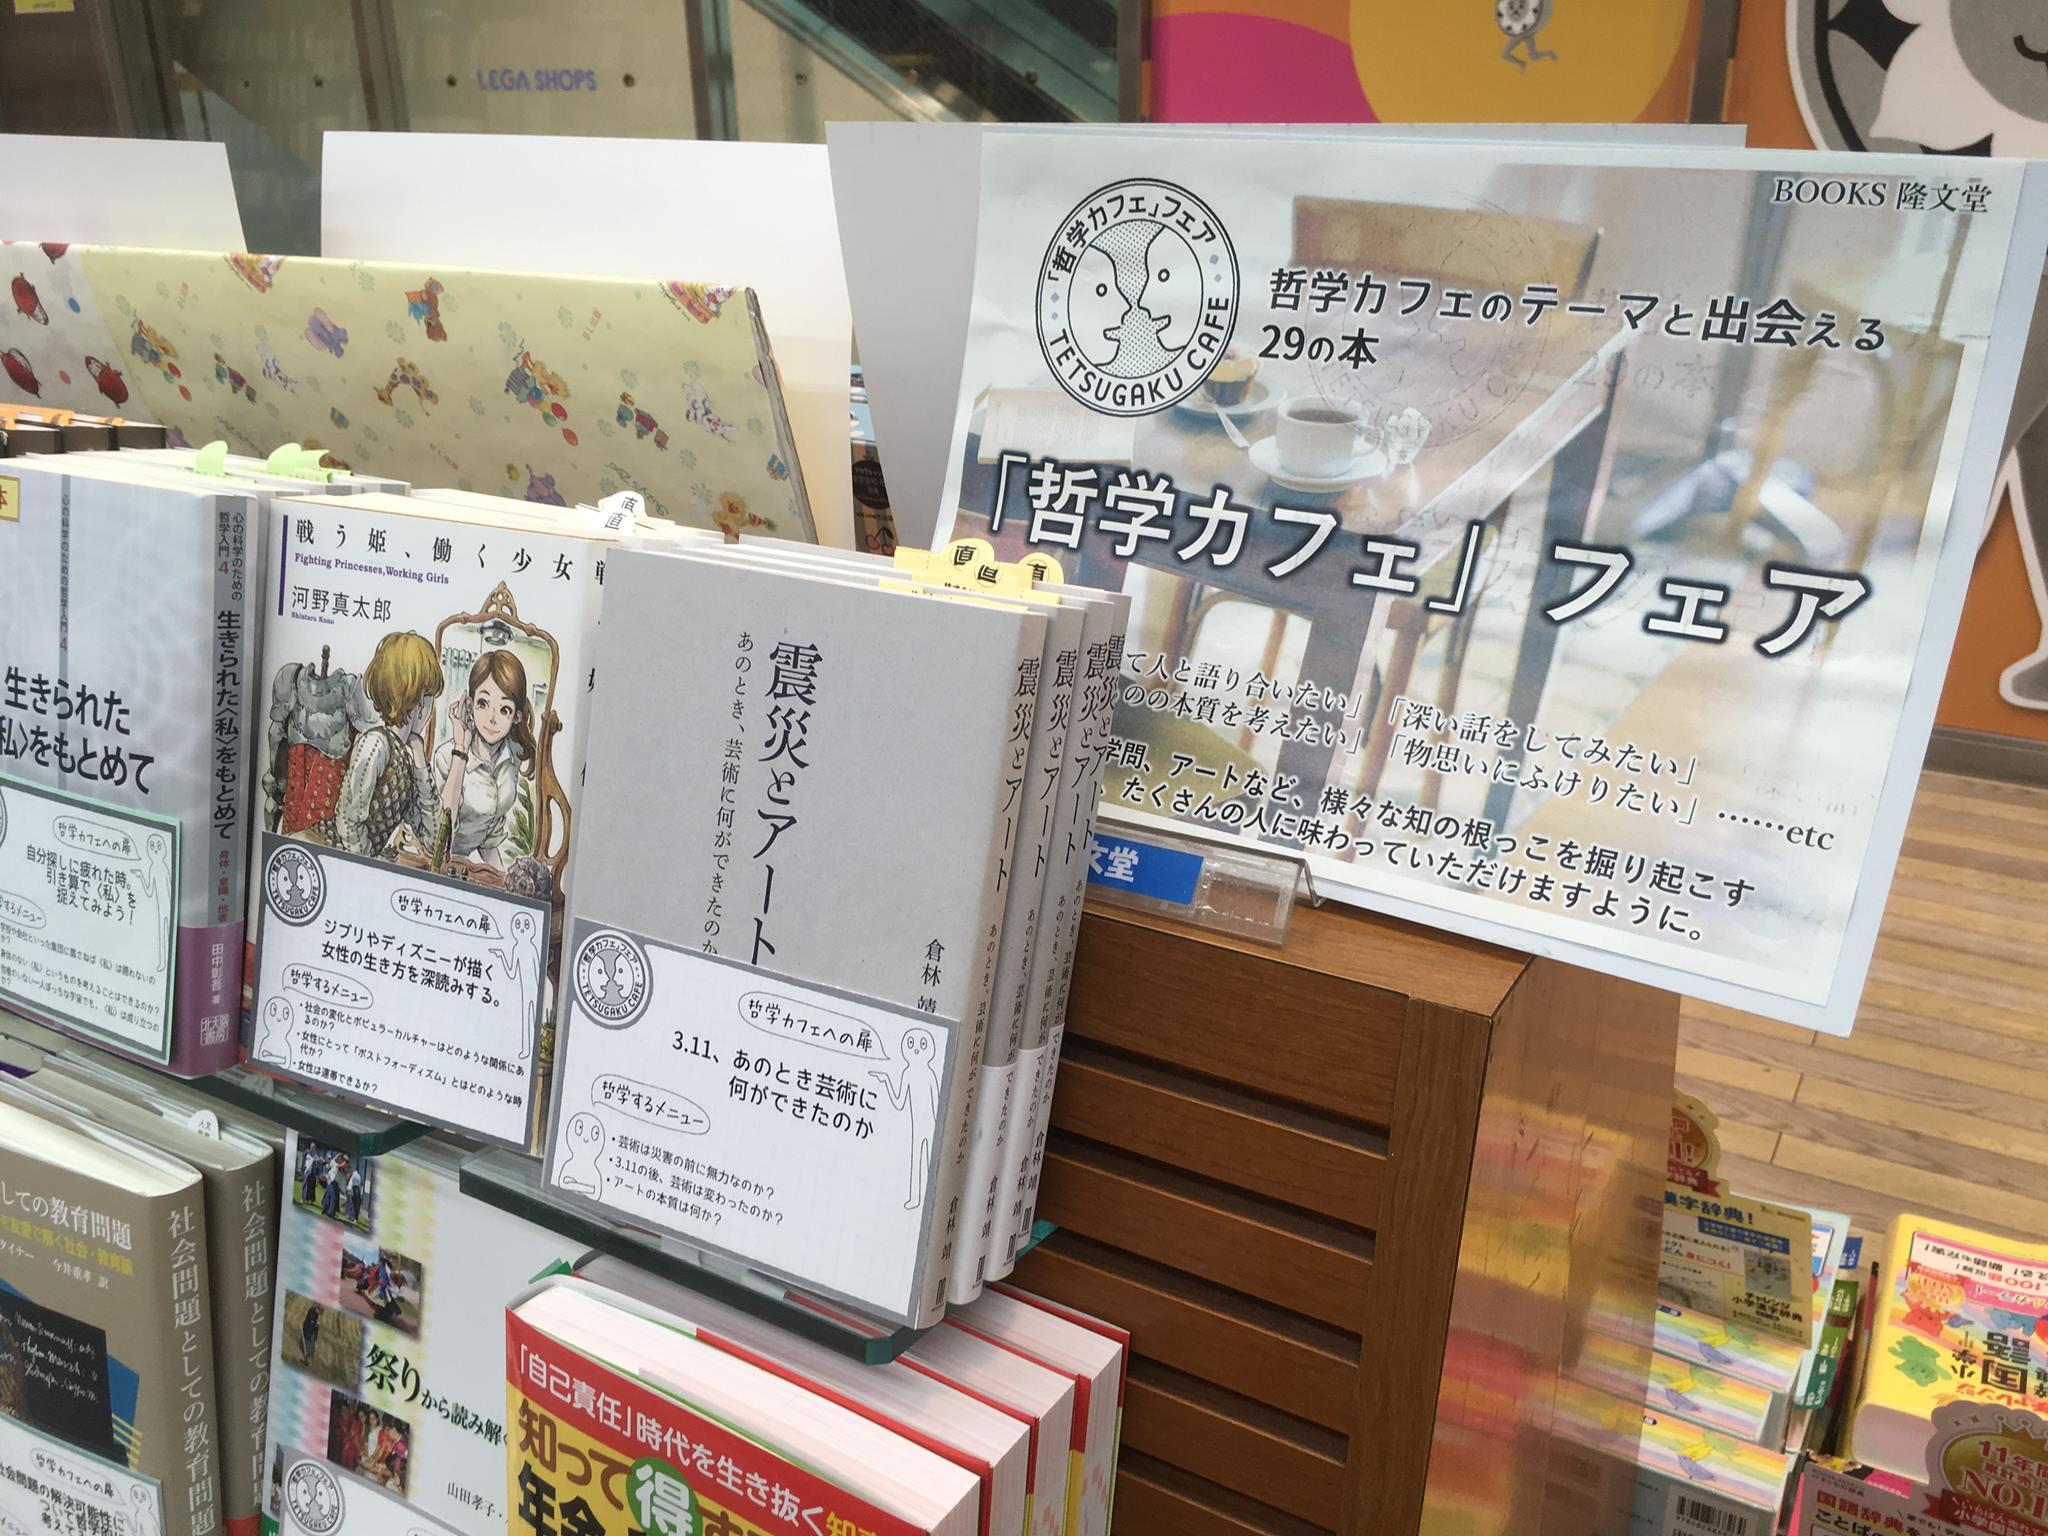 BOOKS隆文堂西国分寺店ブックフェア『哲学カフェのテーマと出会える29の本』第7回